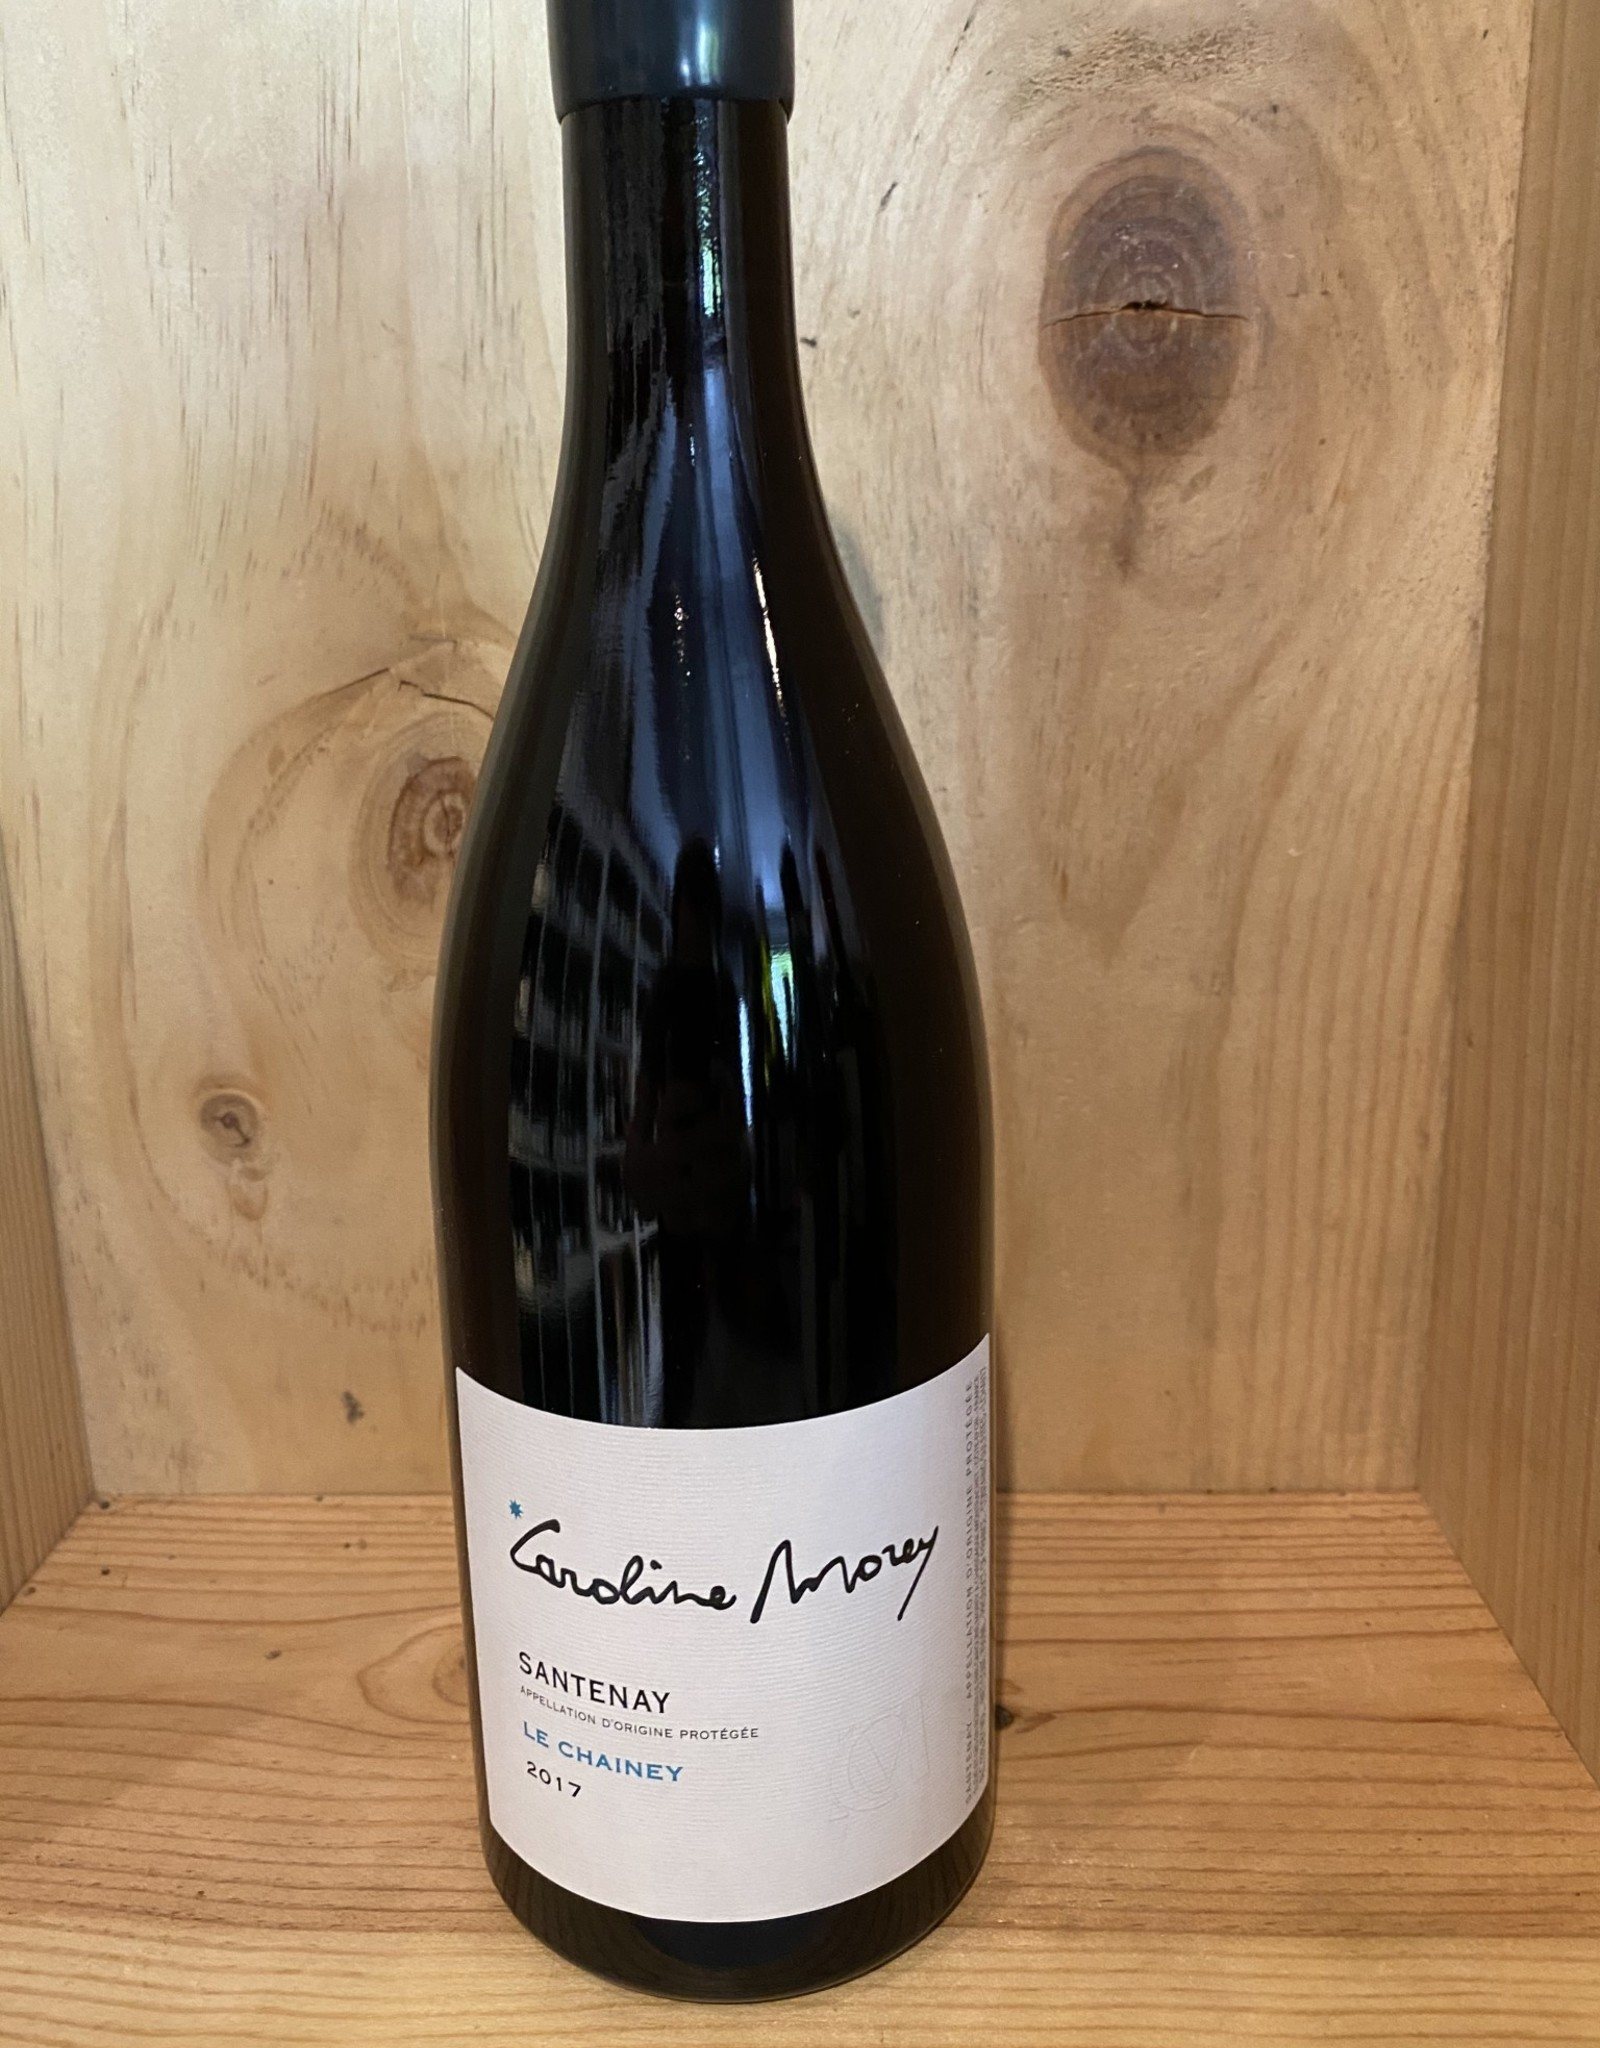 R Burgundy, Santenay Rouge, LE CHAINEY, Caroline Morey 2017